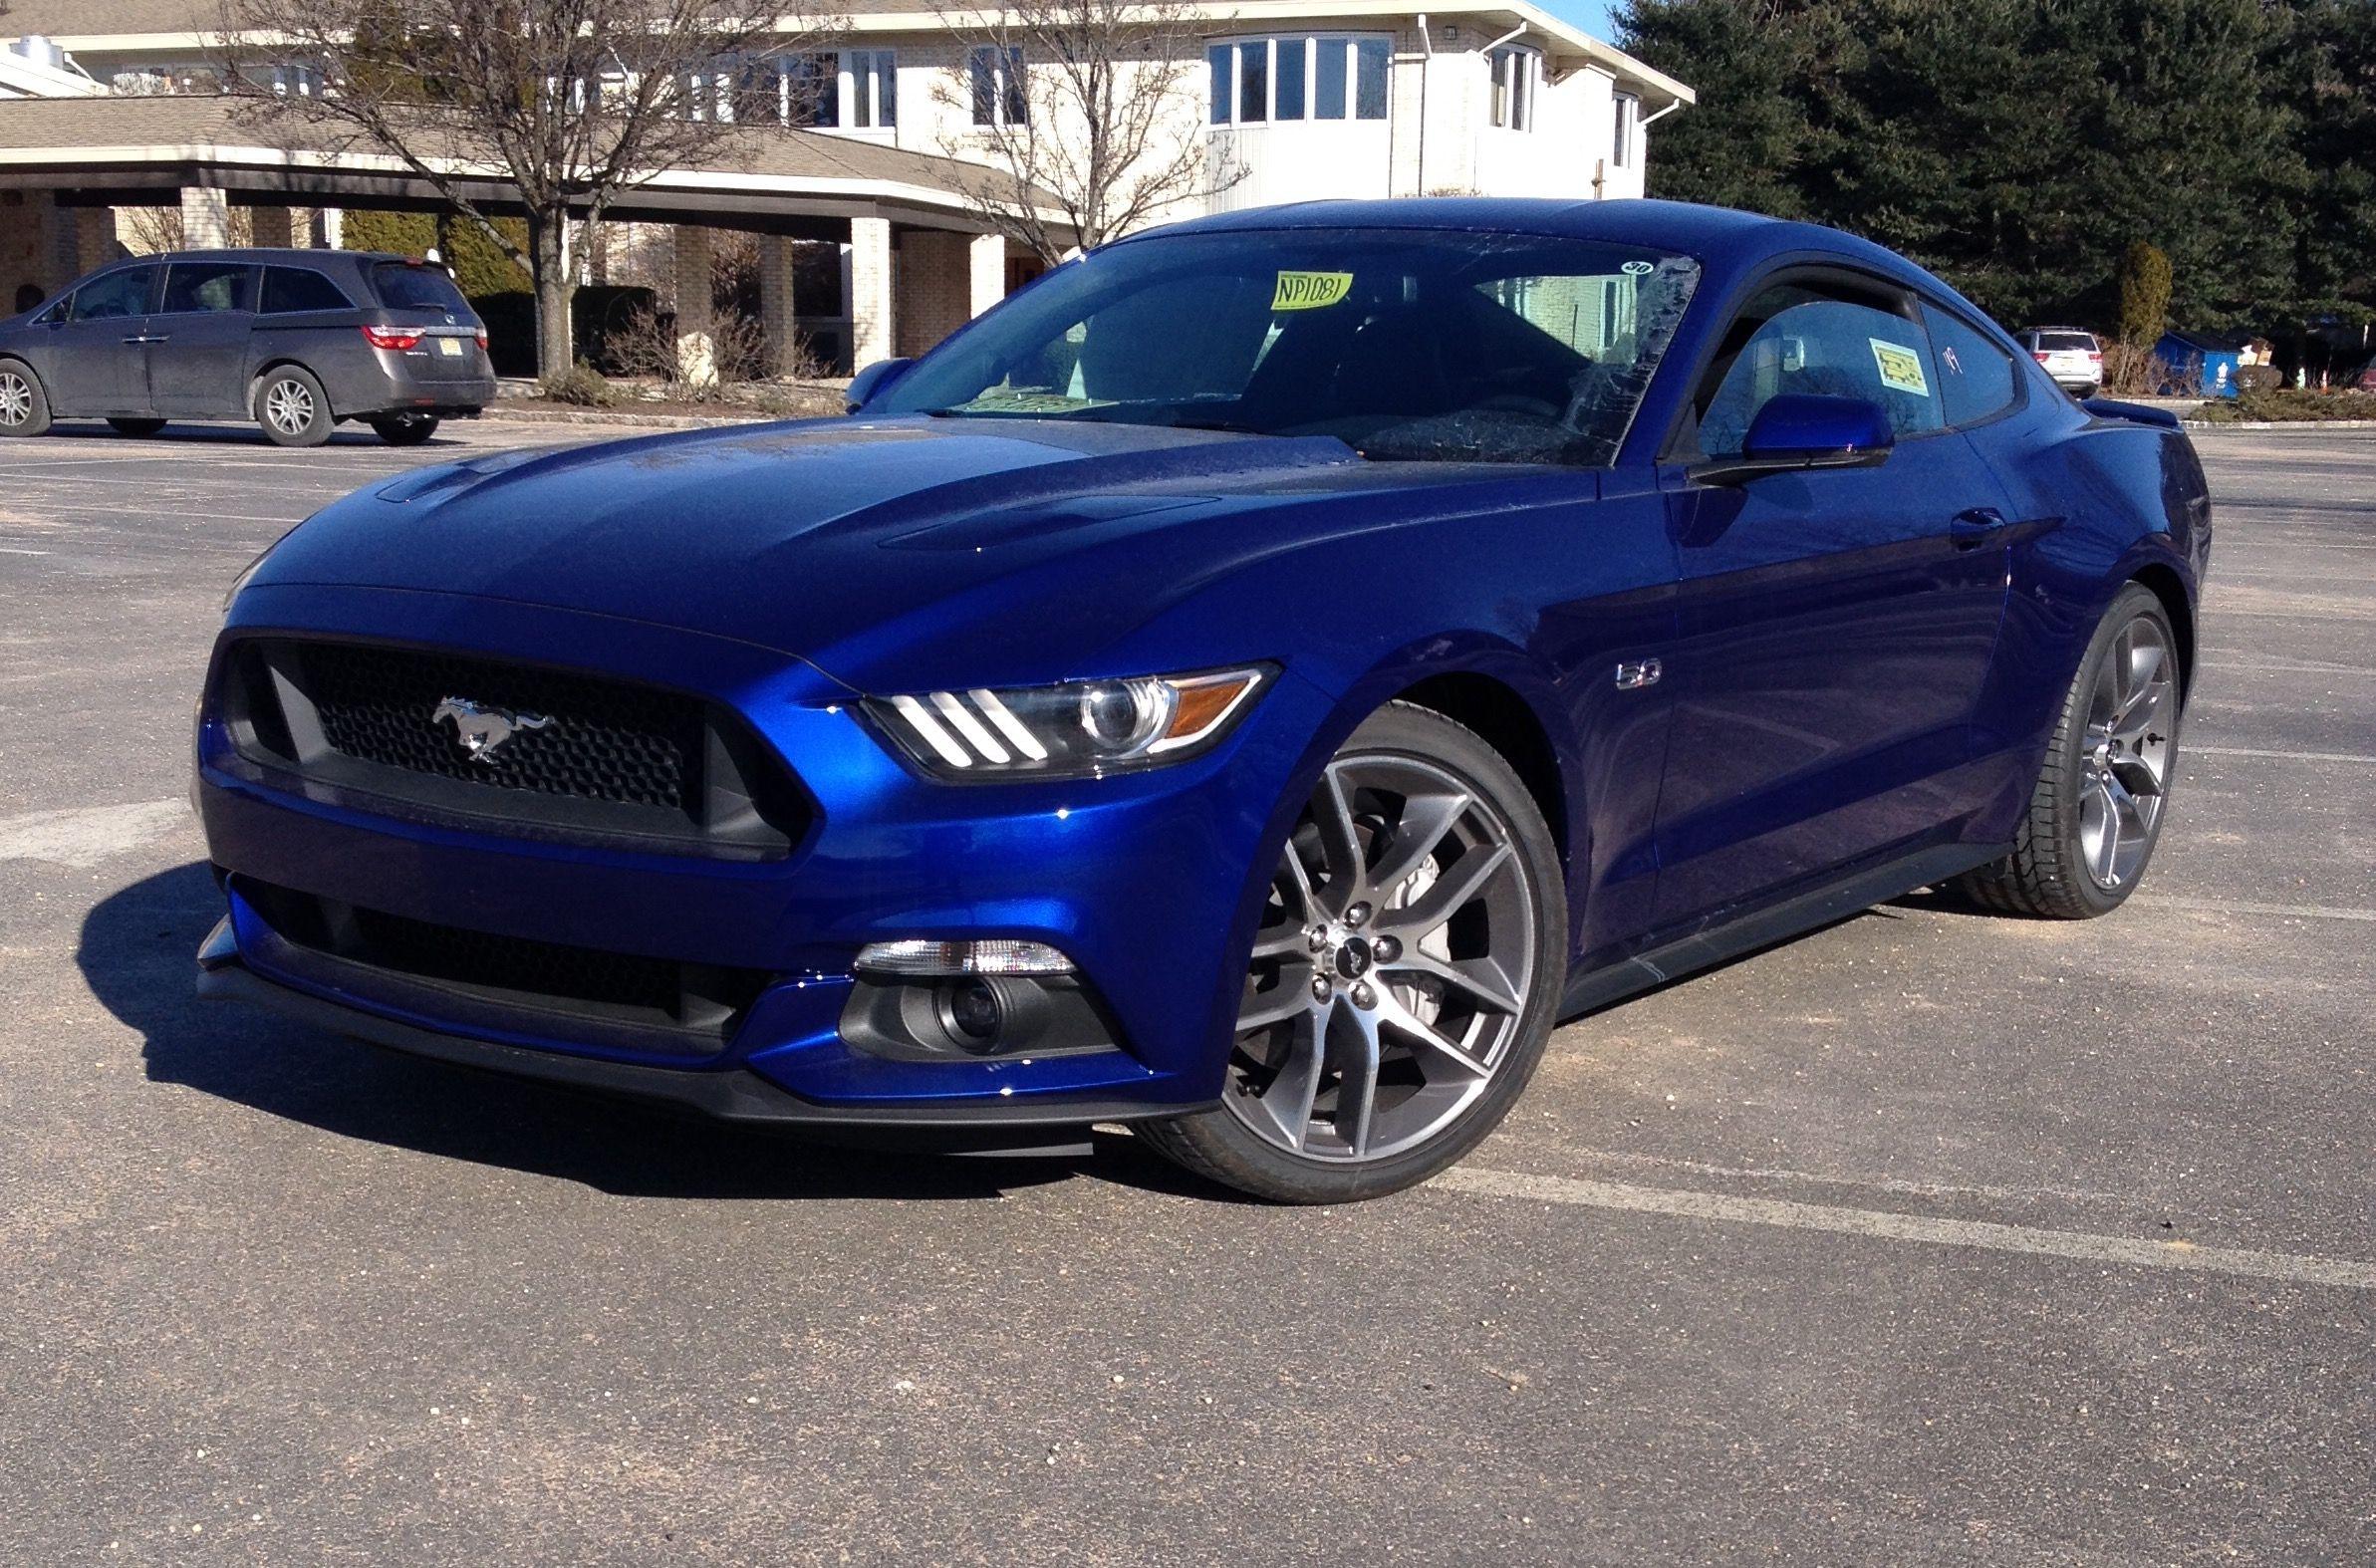 2015 Ford Mustang Gt Review 2015 Ford Mustang Ford Mustang Blue Mustang